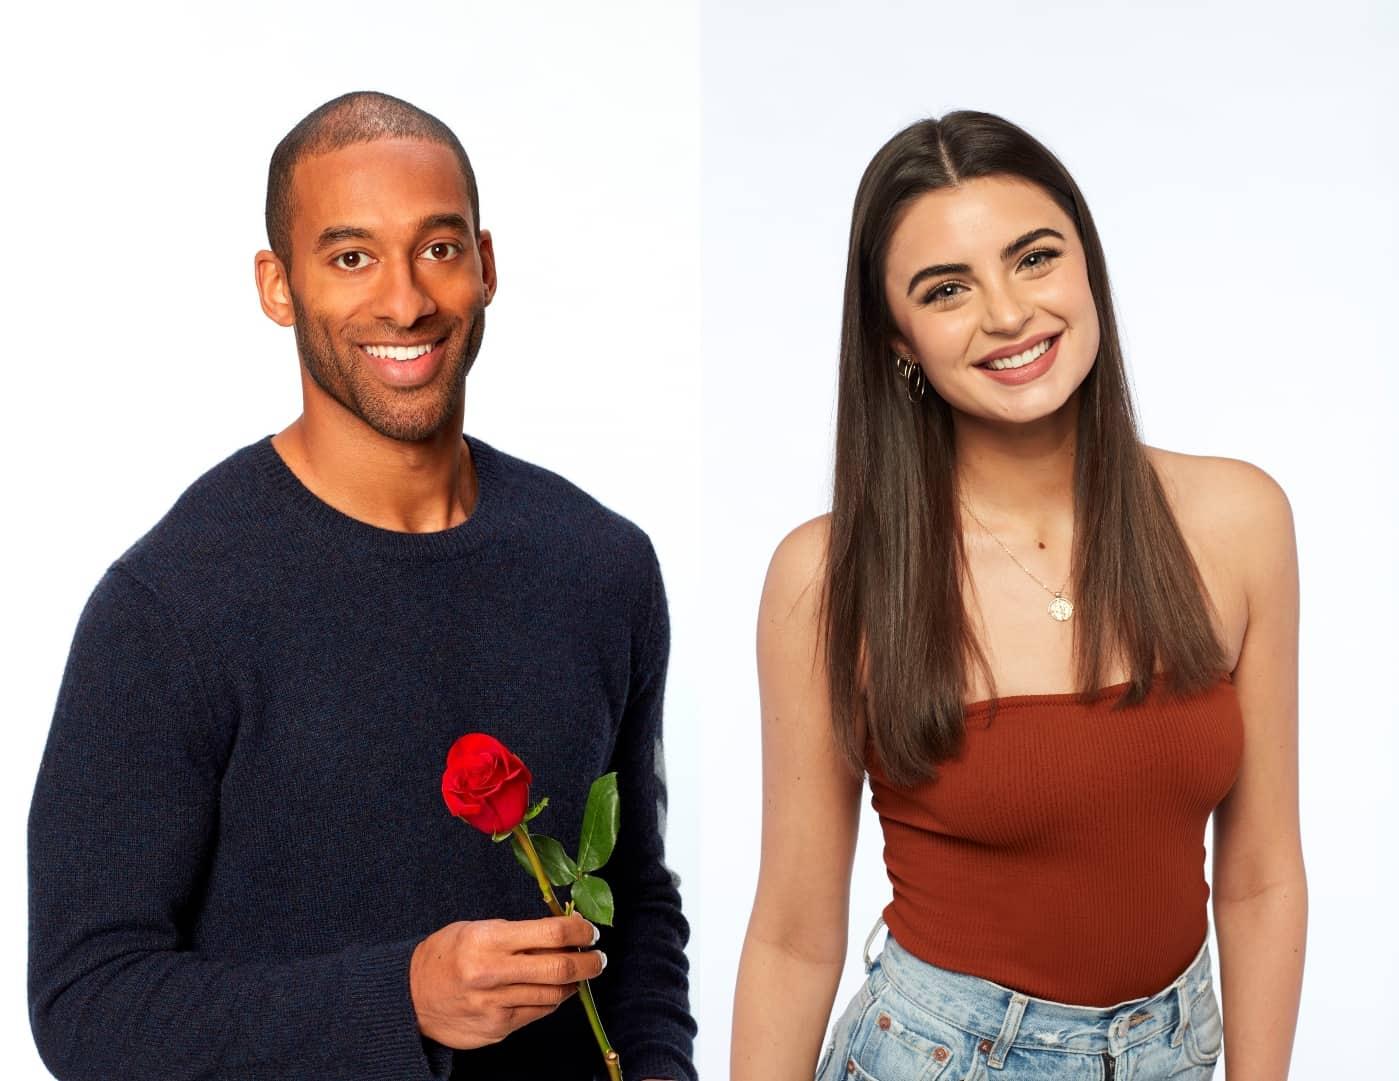 The Bachelor spoilers Matt James winner final pick Rachael Kirkconnell